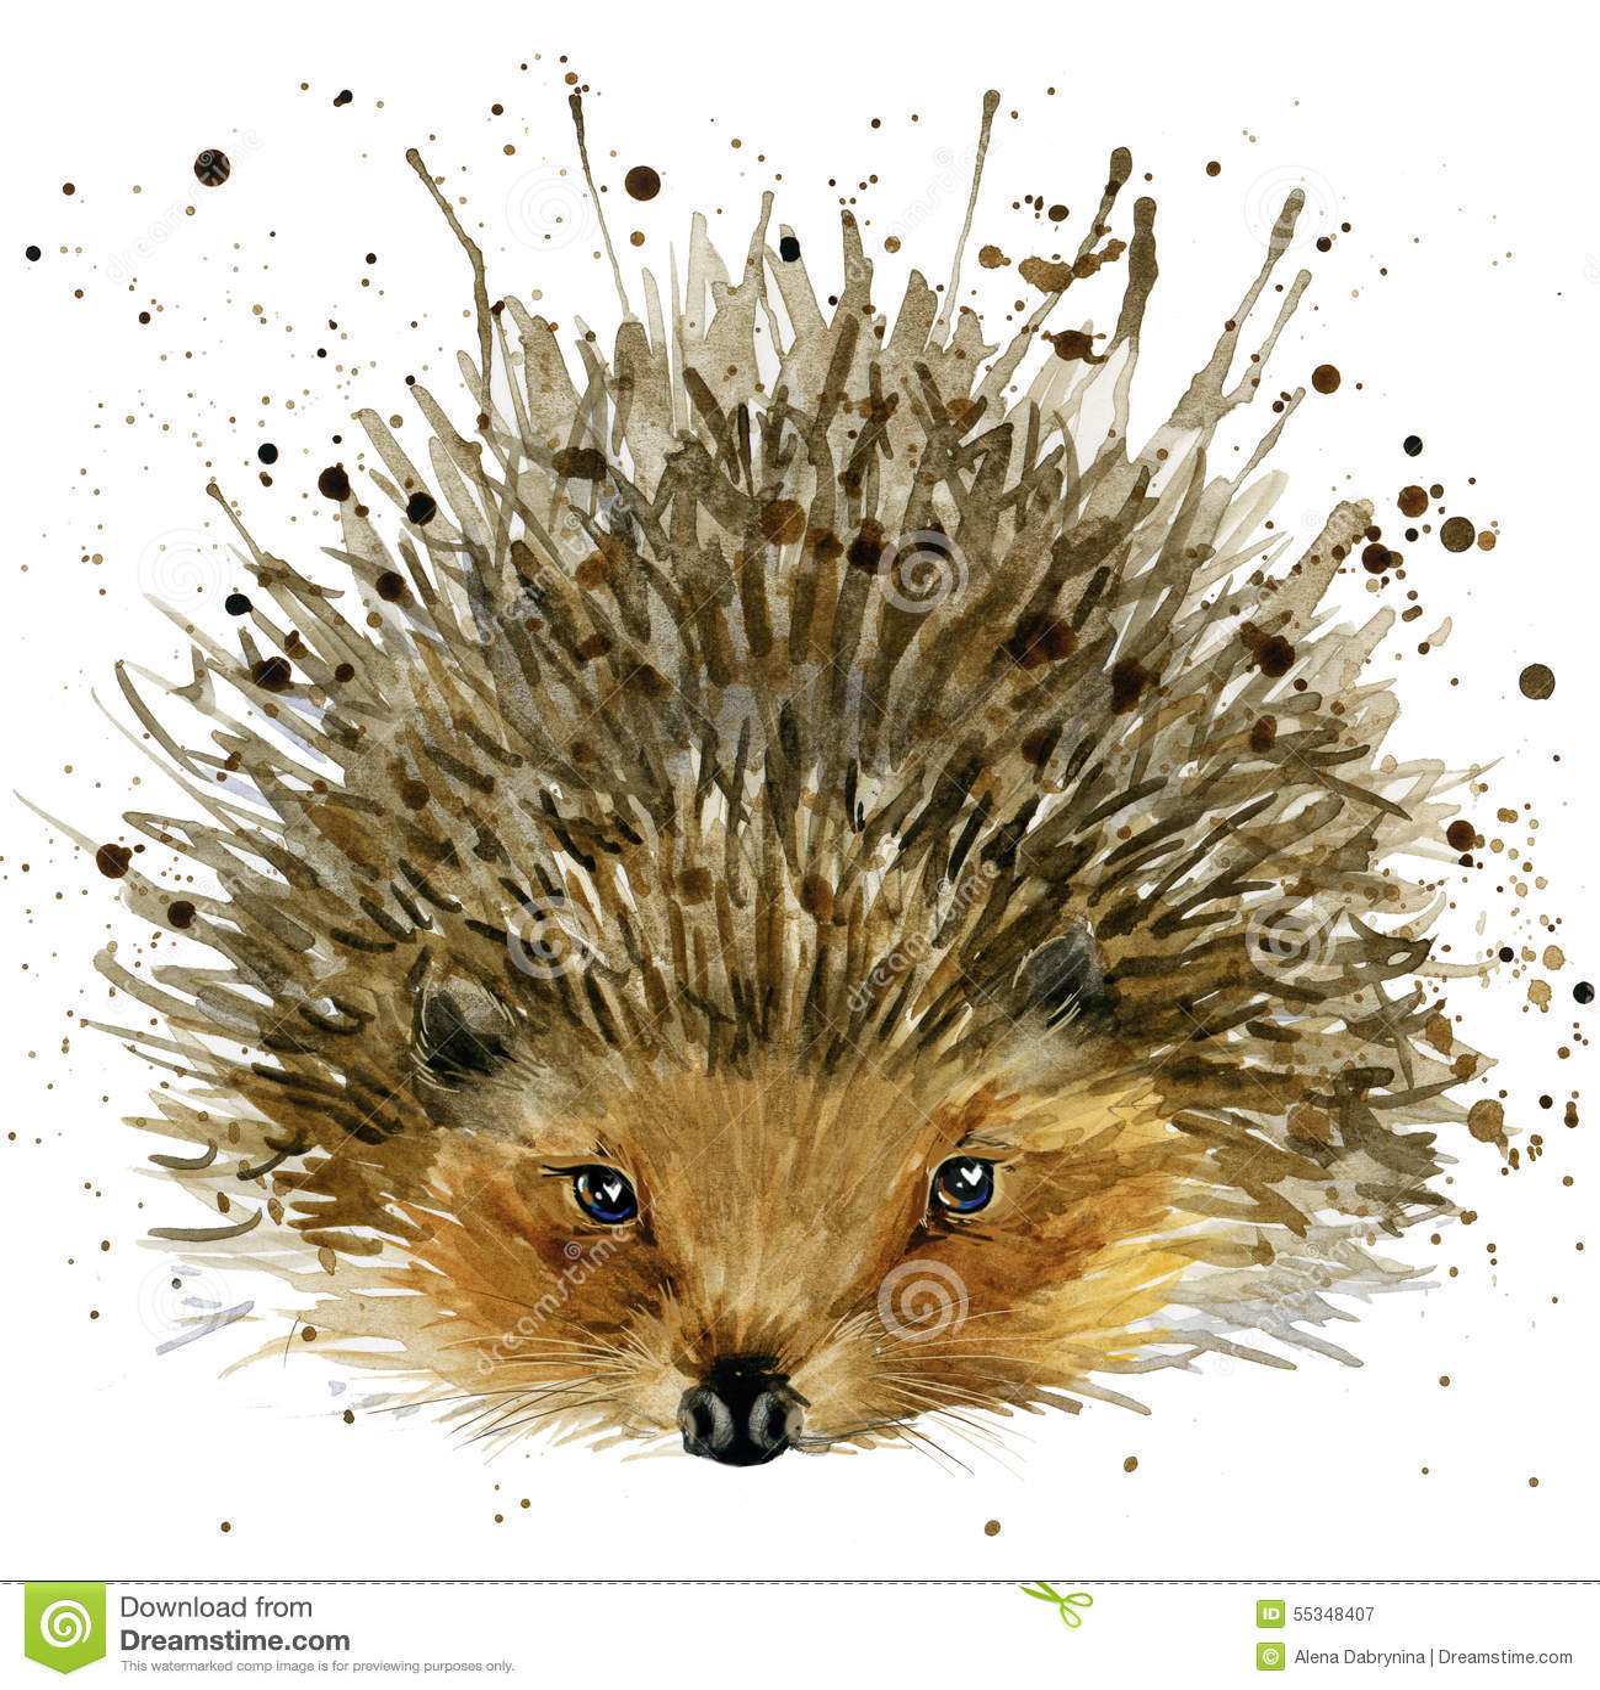 Hedgehog Illustration With Splash Watercolor Textured